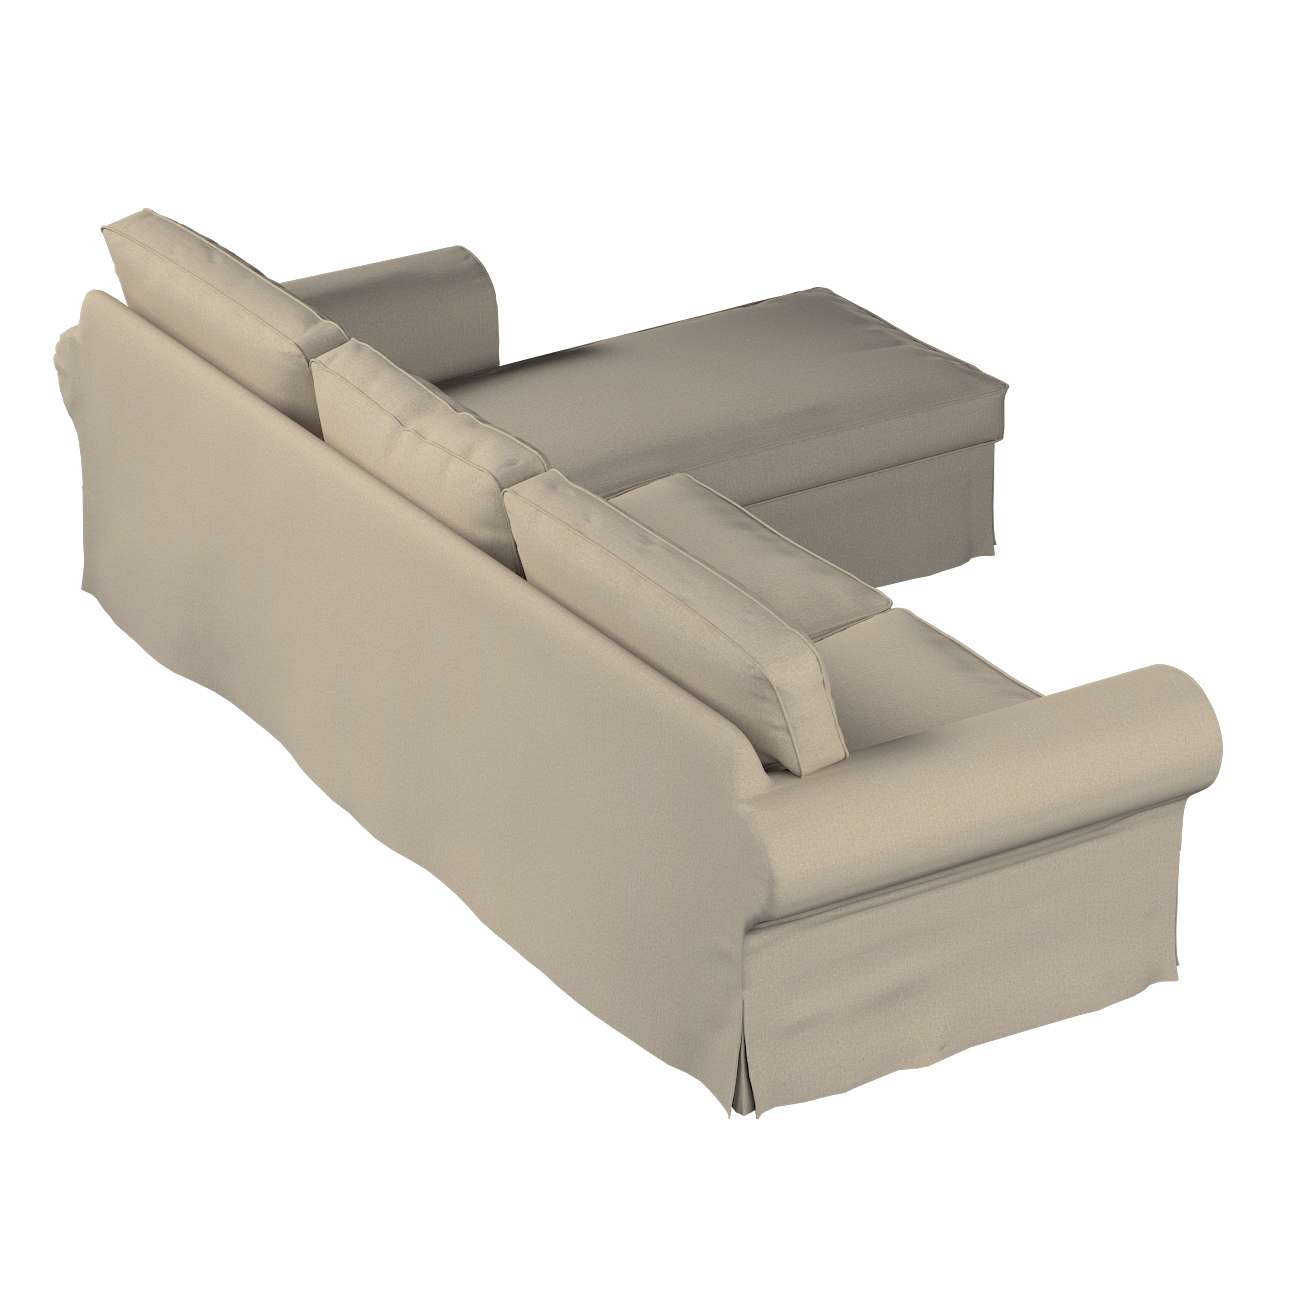 Ektorp 2-Sitzer Sofabezug mit Recamiere Ektorp 2-Sitzer Sofabezug mit Recamiere von der Kollektion Edinburgh , Stoff: 115-78